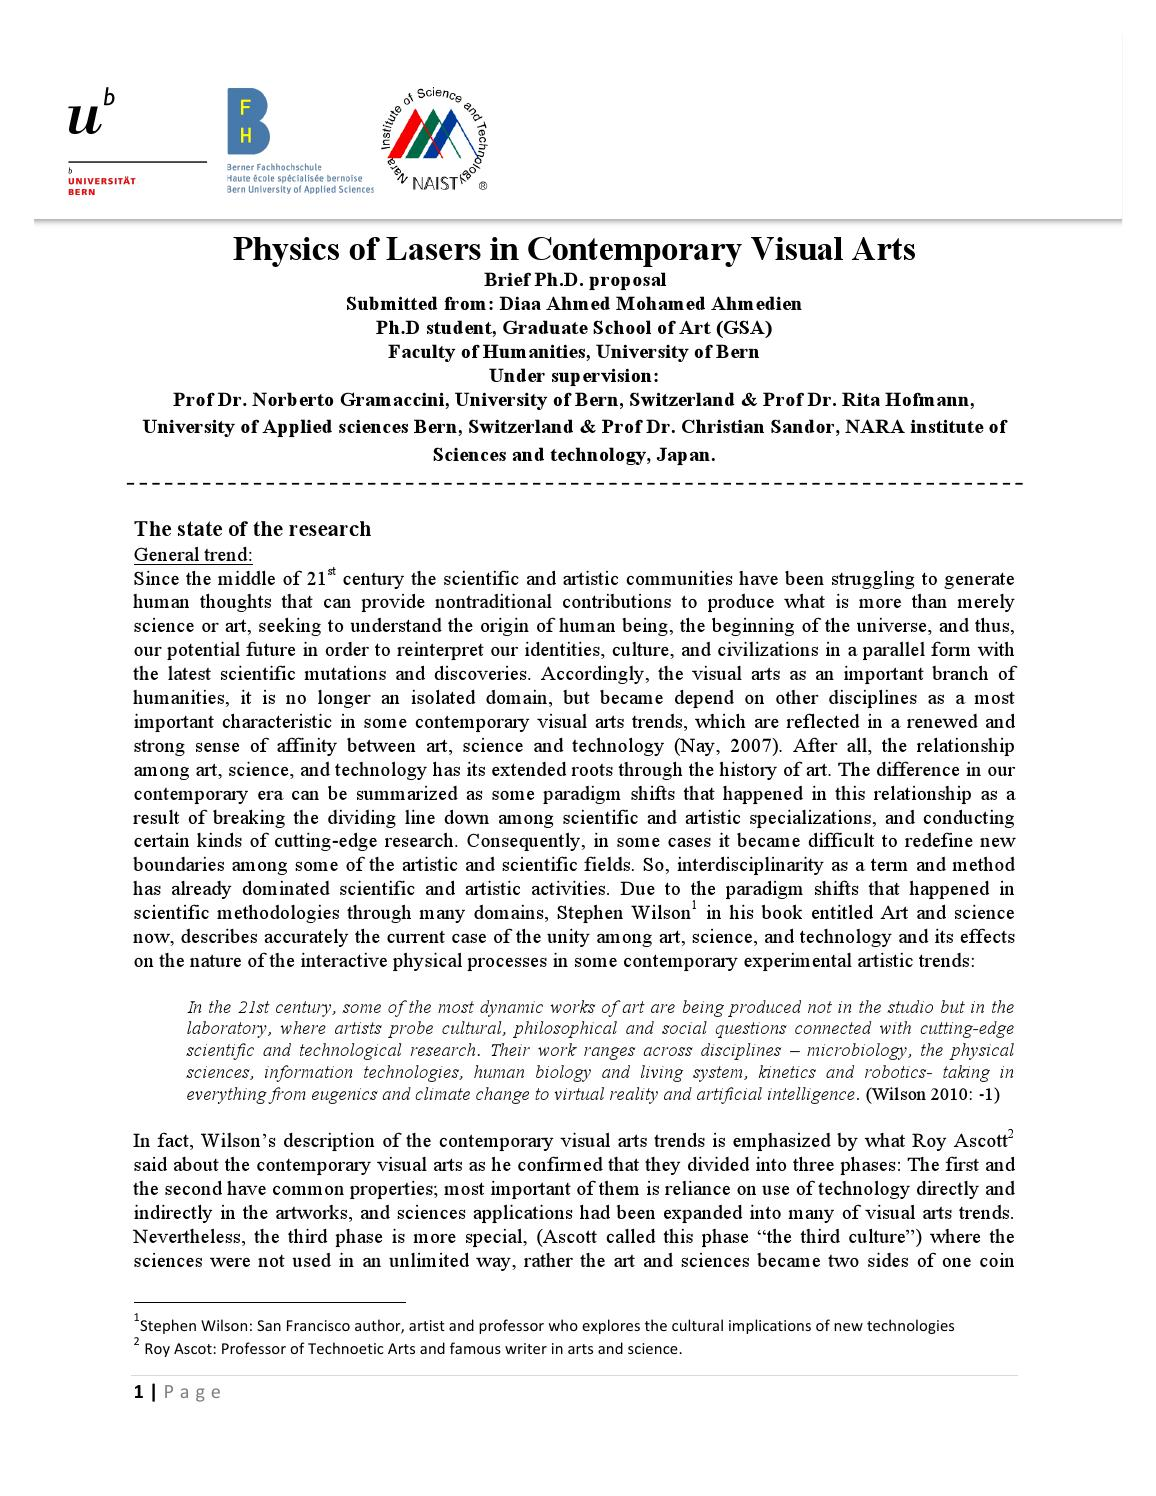 Phd thesis japan